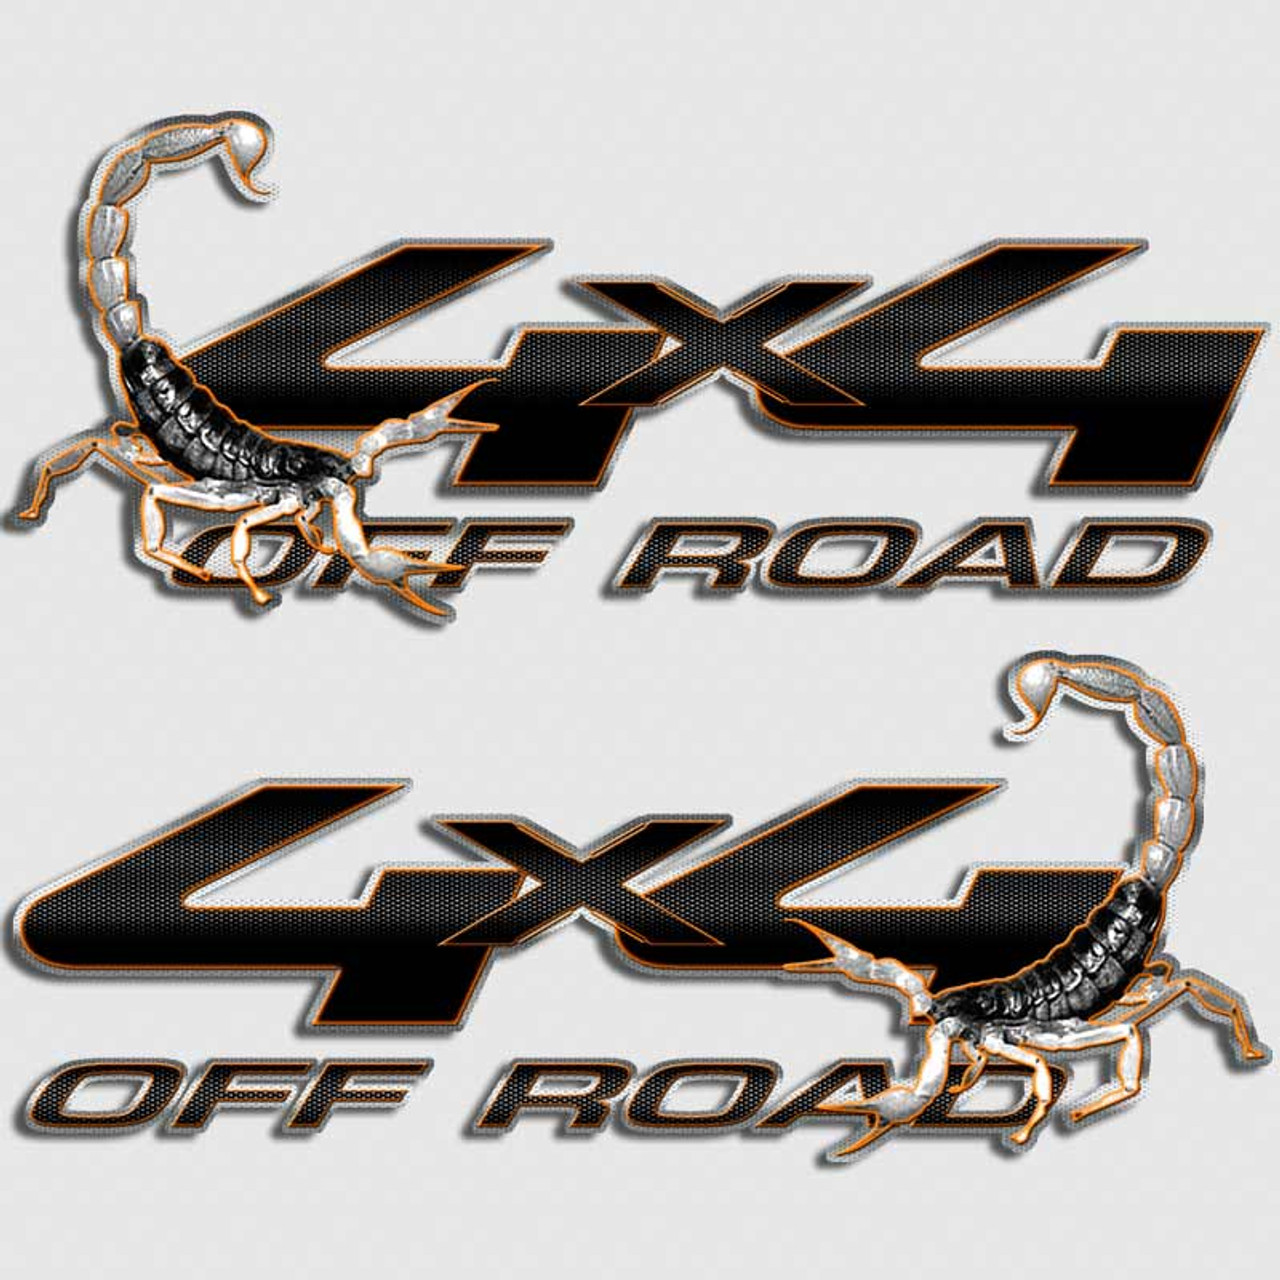 Scorpion stinger 4x4 ford decals carbon fiber truck sticker